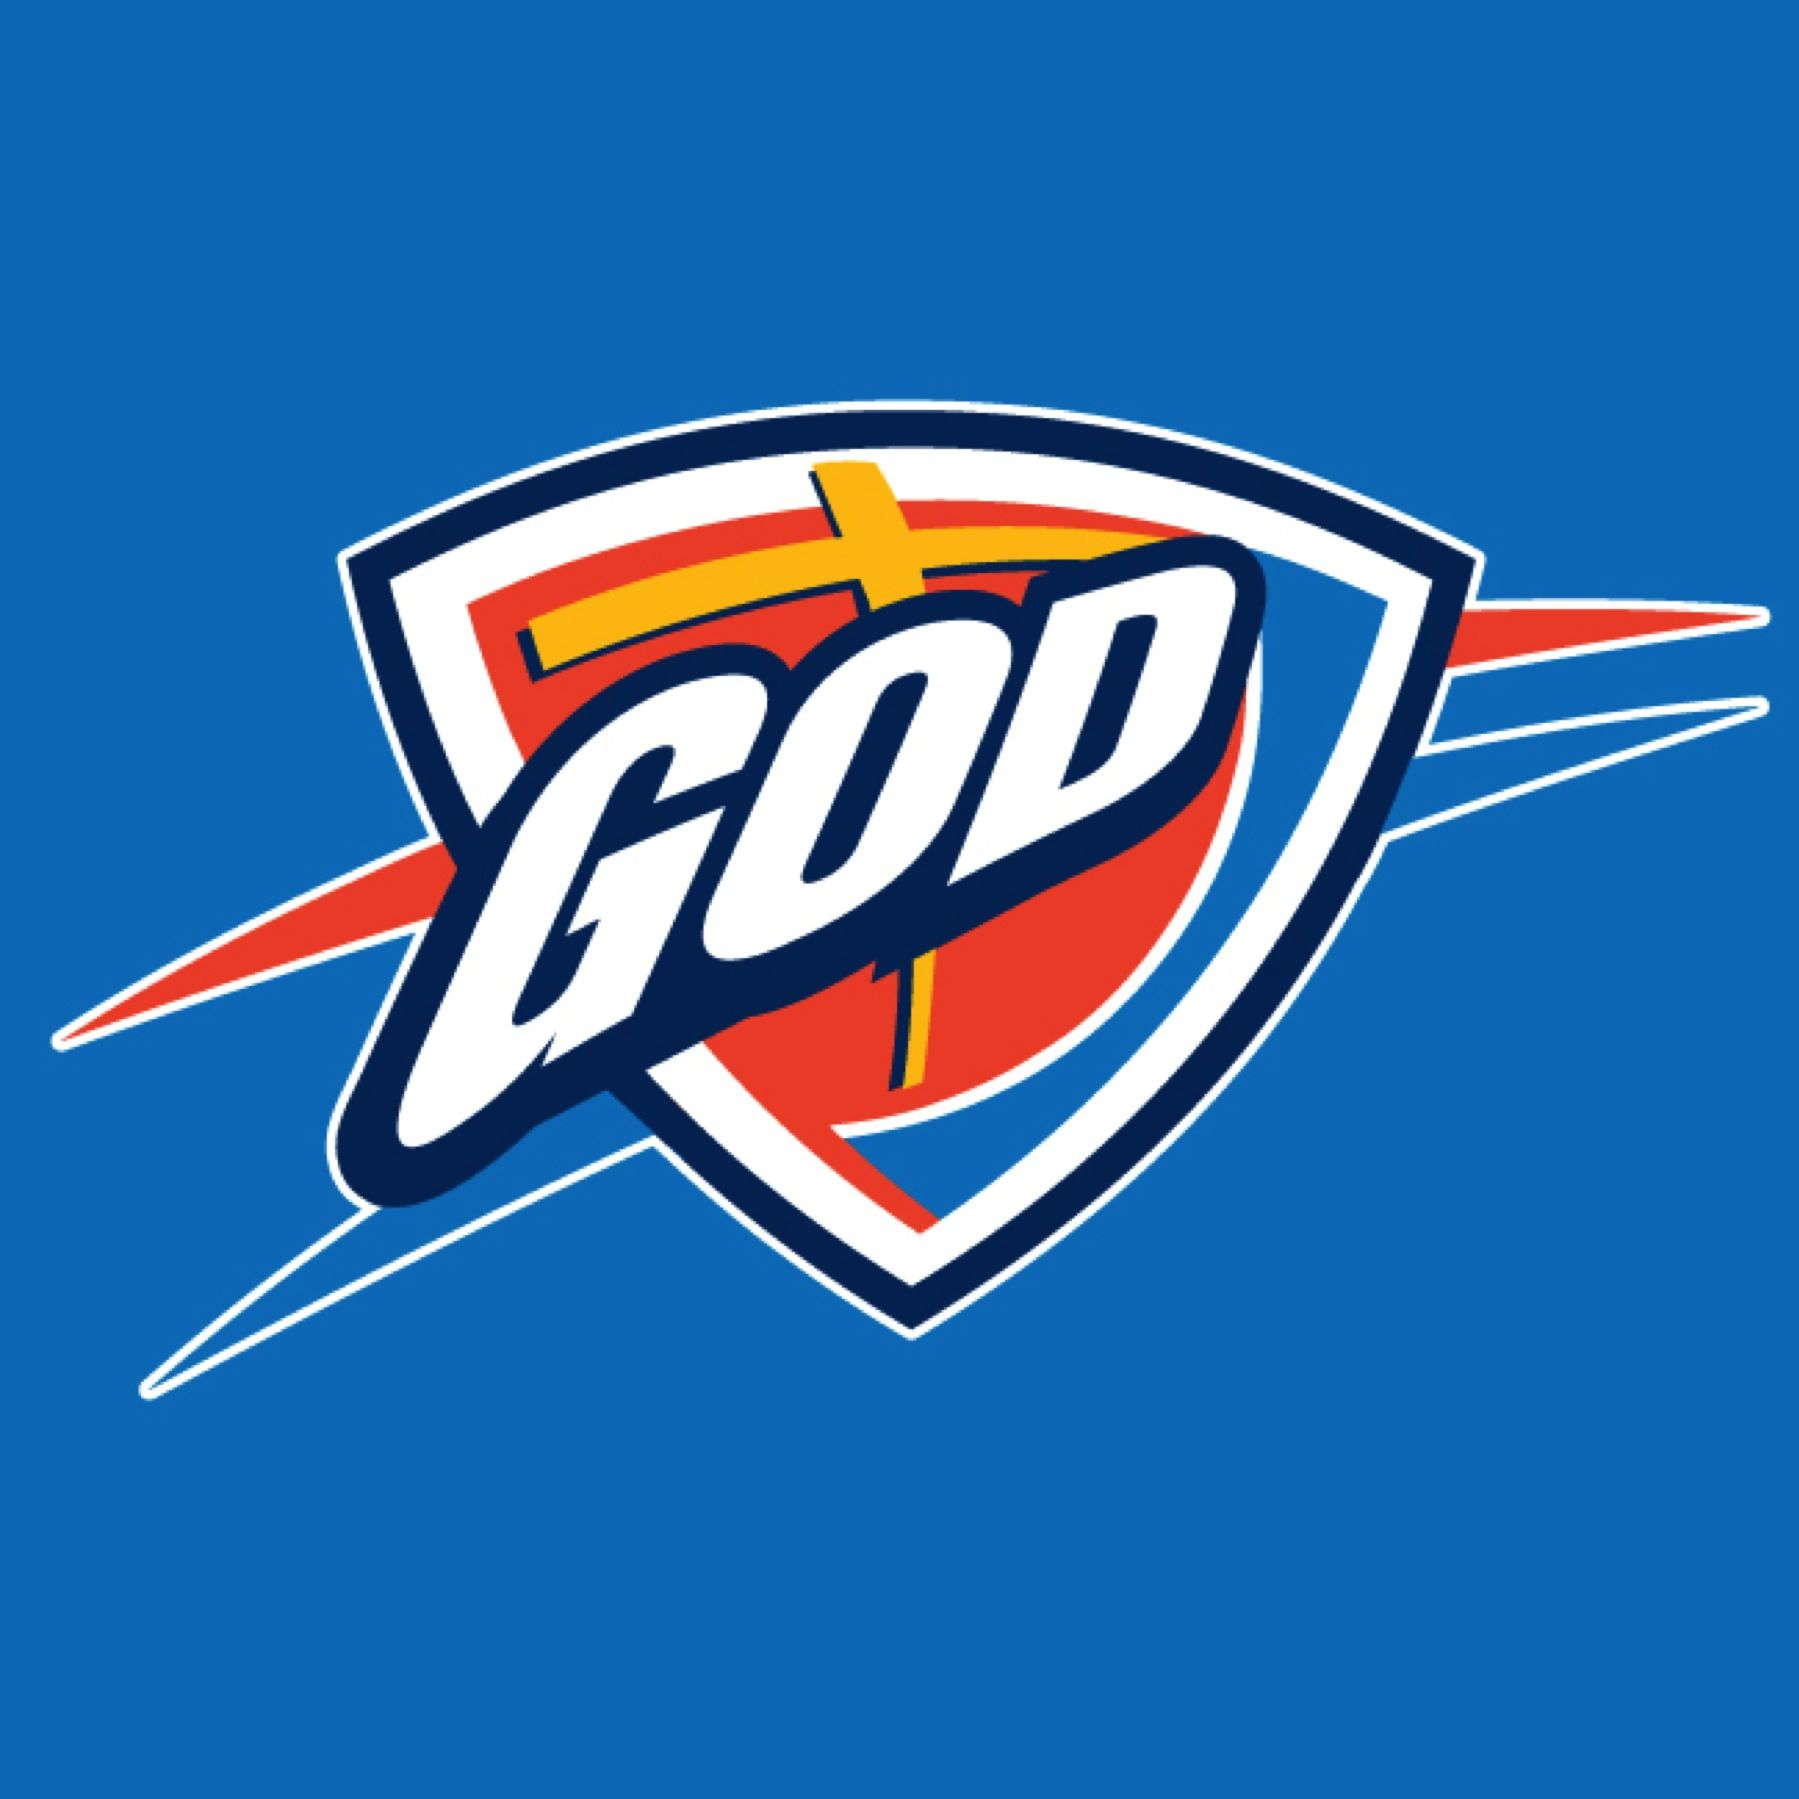 T shirt design qld - Christian Sports Parody T Shirt Design For Thunder Fans Www Kjvapparel Com